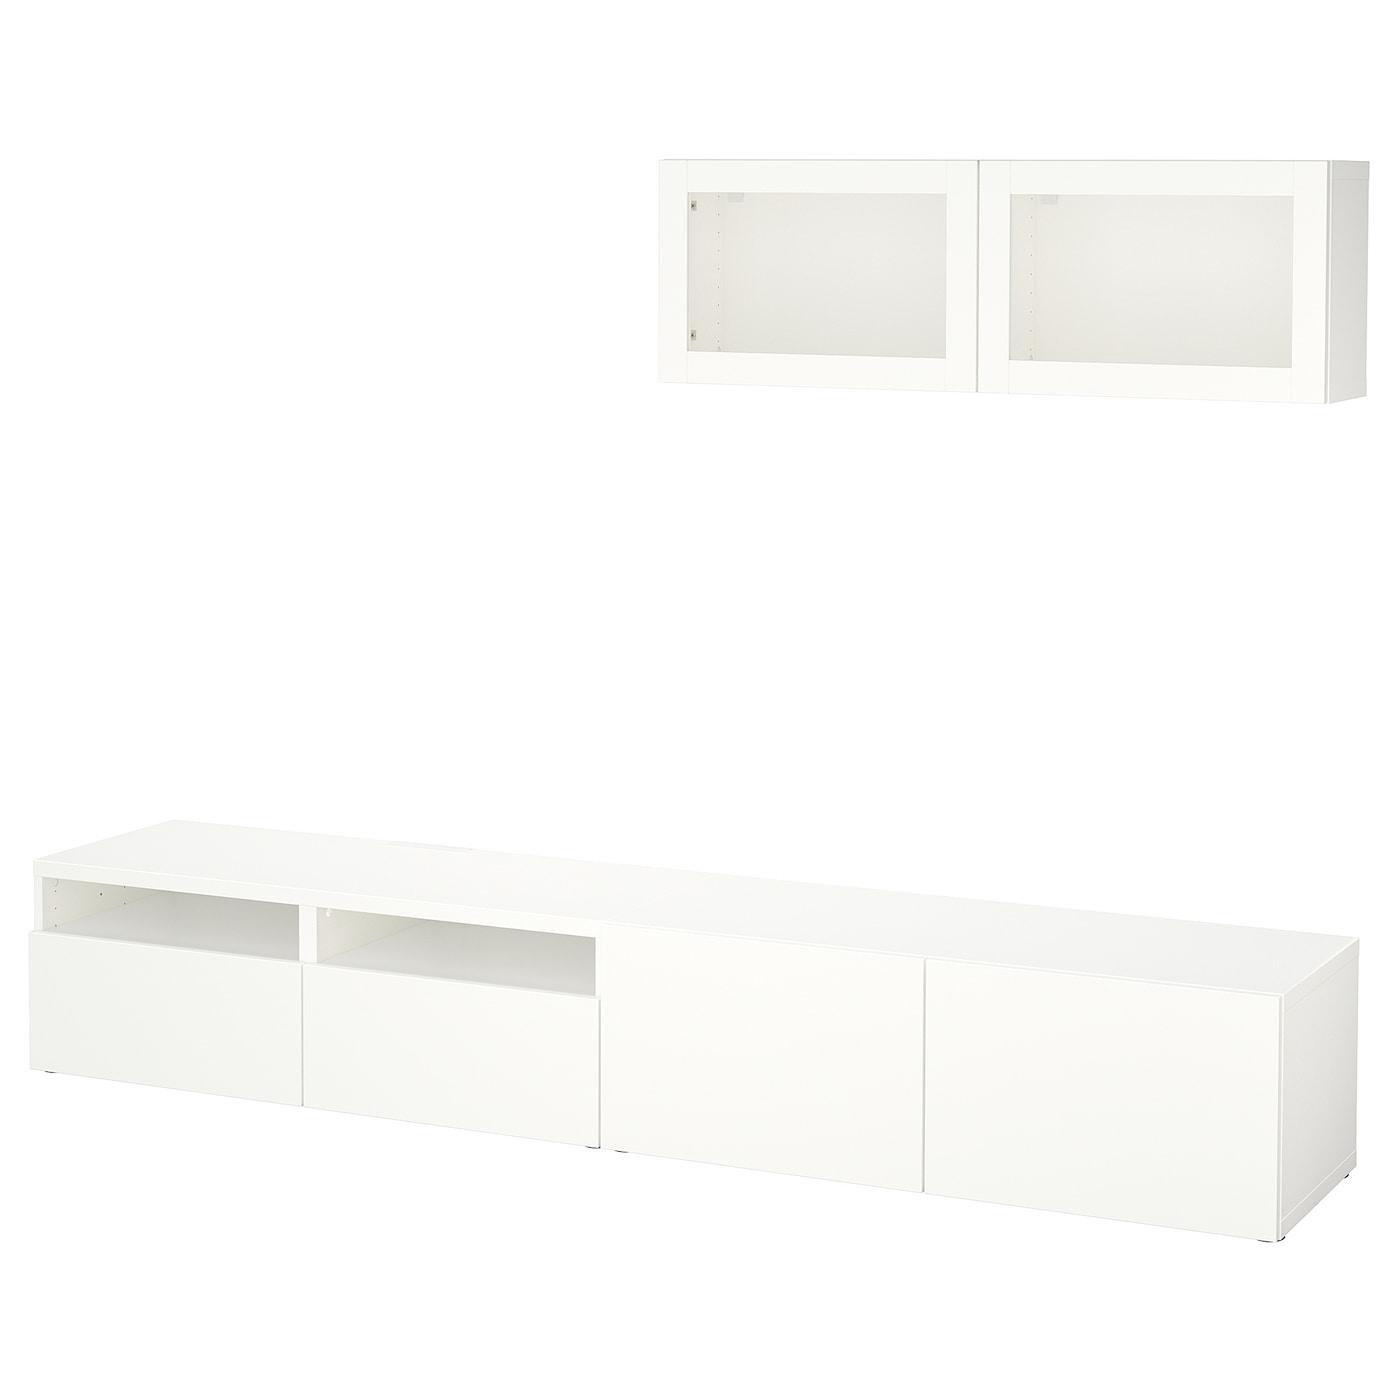 Best mueble tv con almacenaje lappviken sindvik vidrio transparente blanco 240 x 20 40 x 166 cm - Muebles almacenaje ikea ...